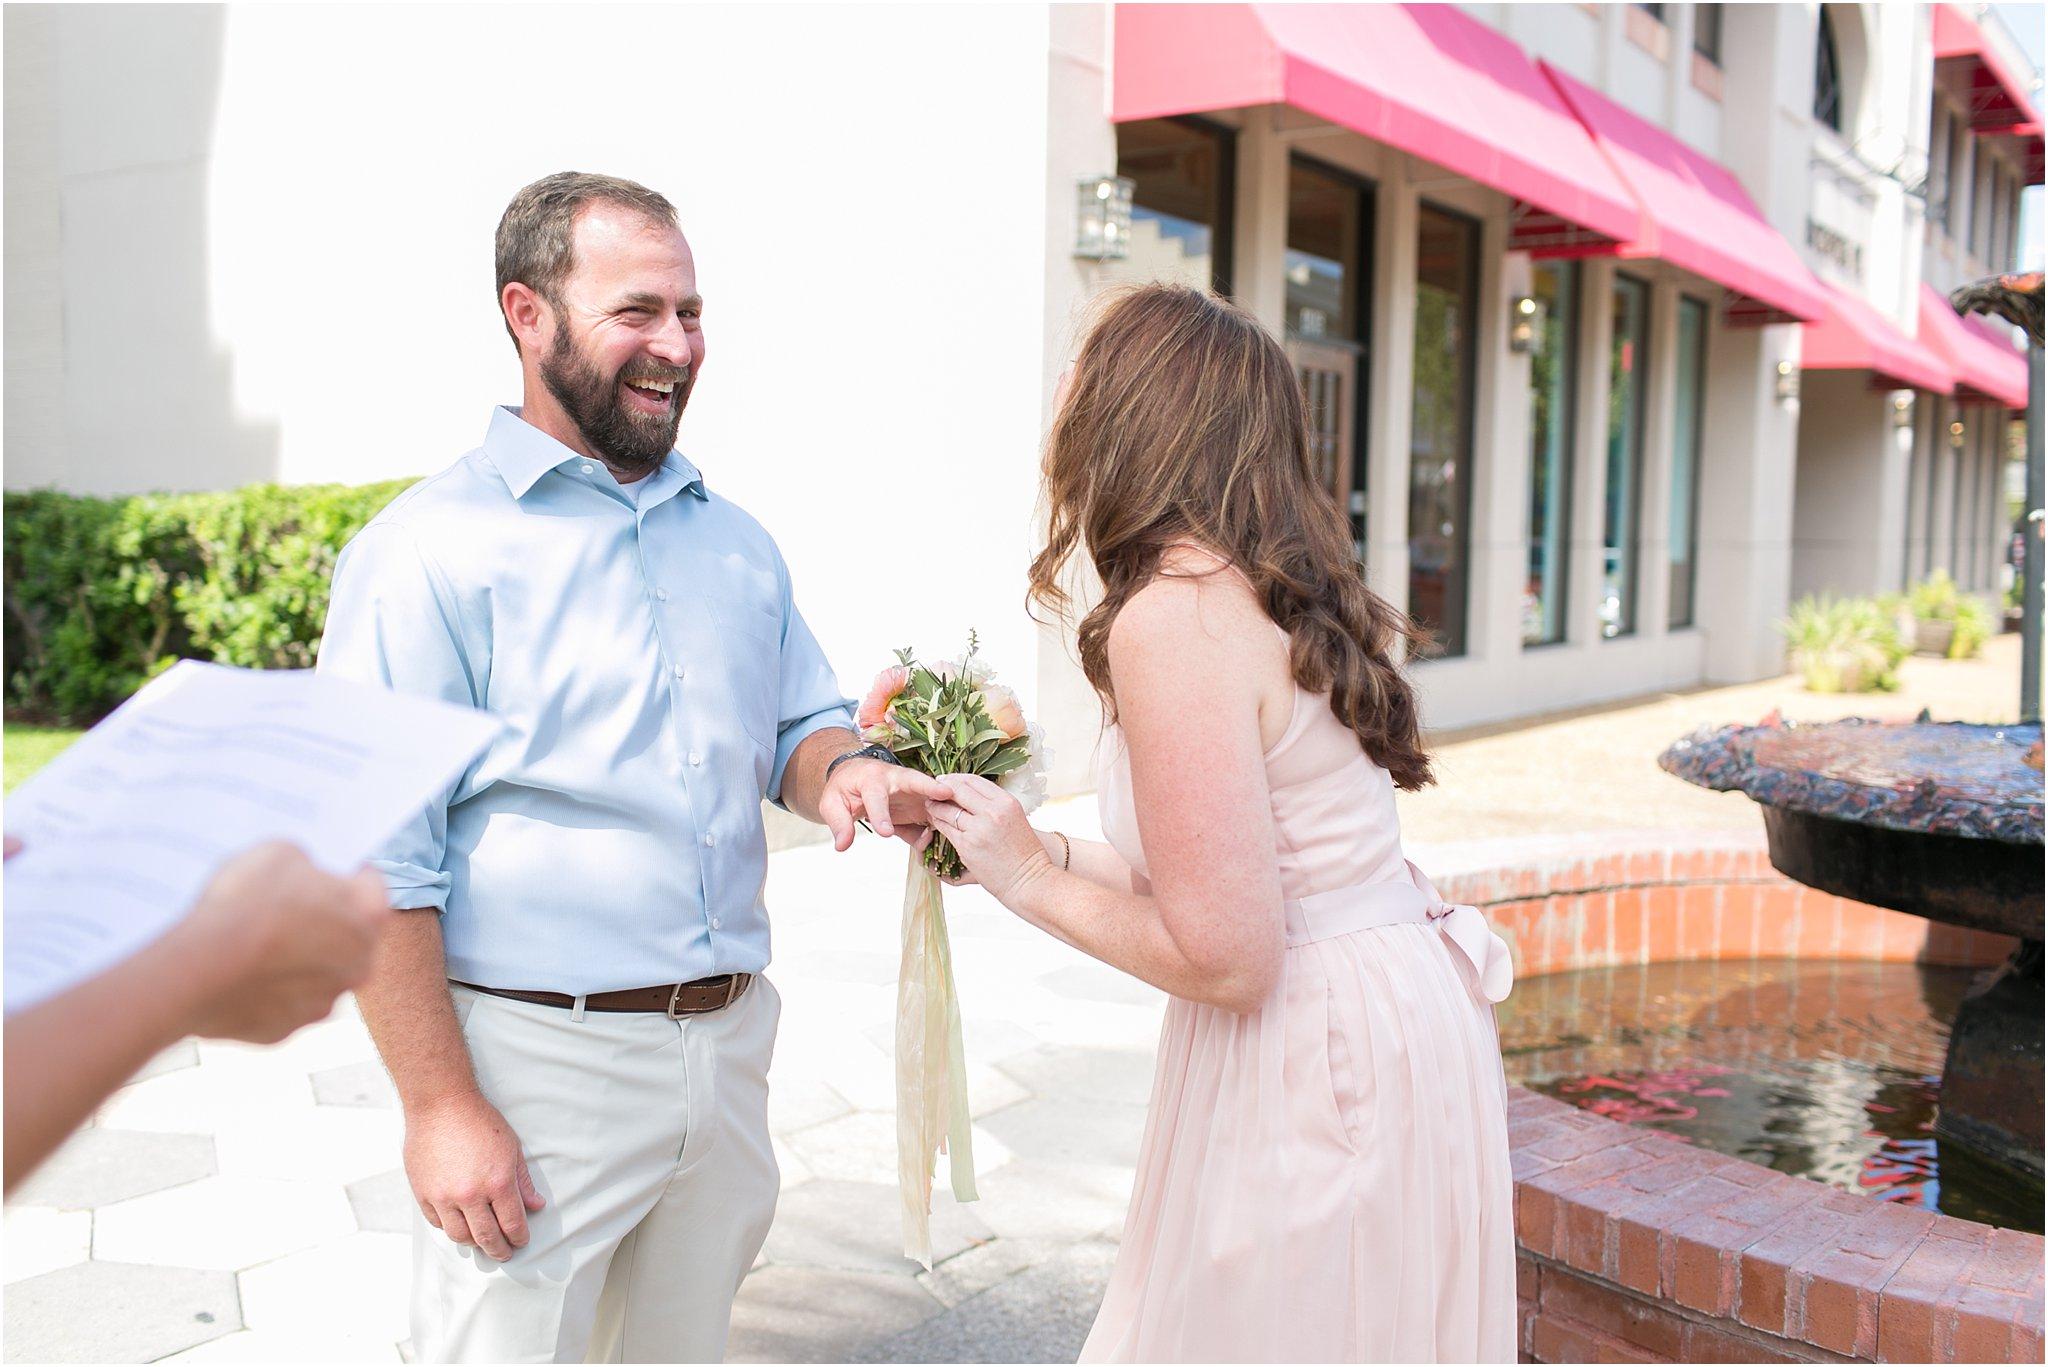 jessica_ryan_photography_wedding_photographs_virginia_fernandina_beach_florida_wedding_2103